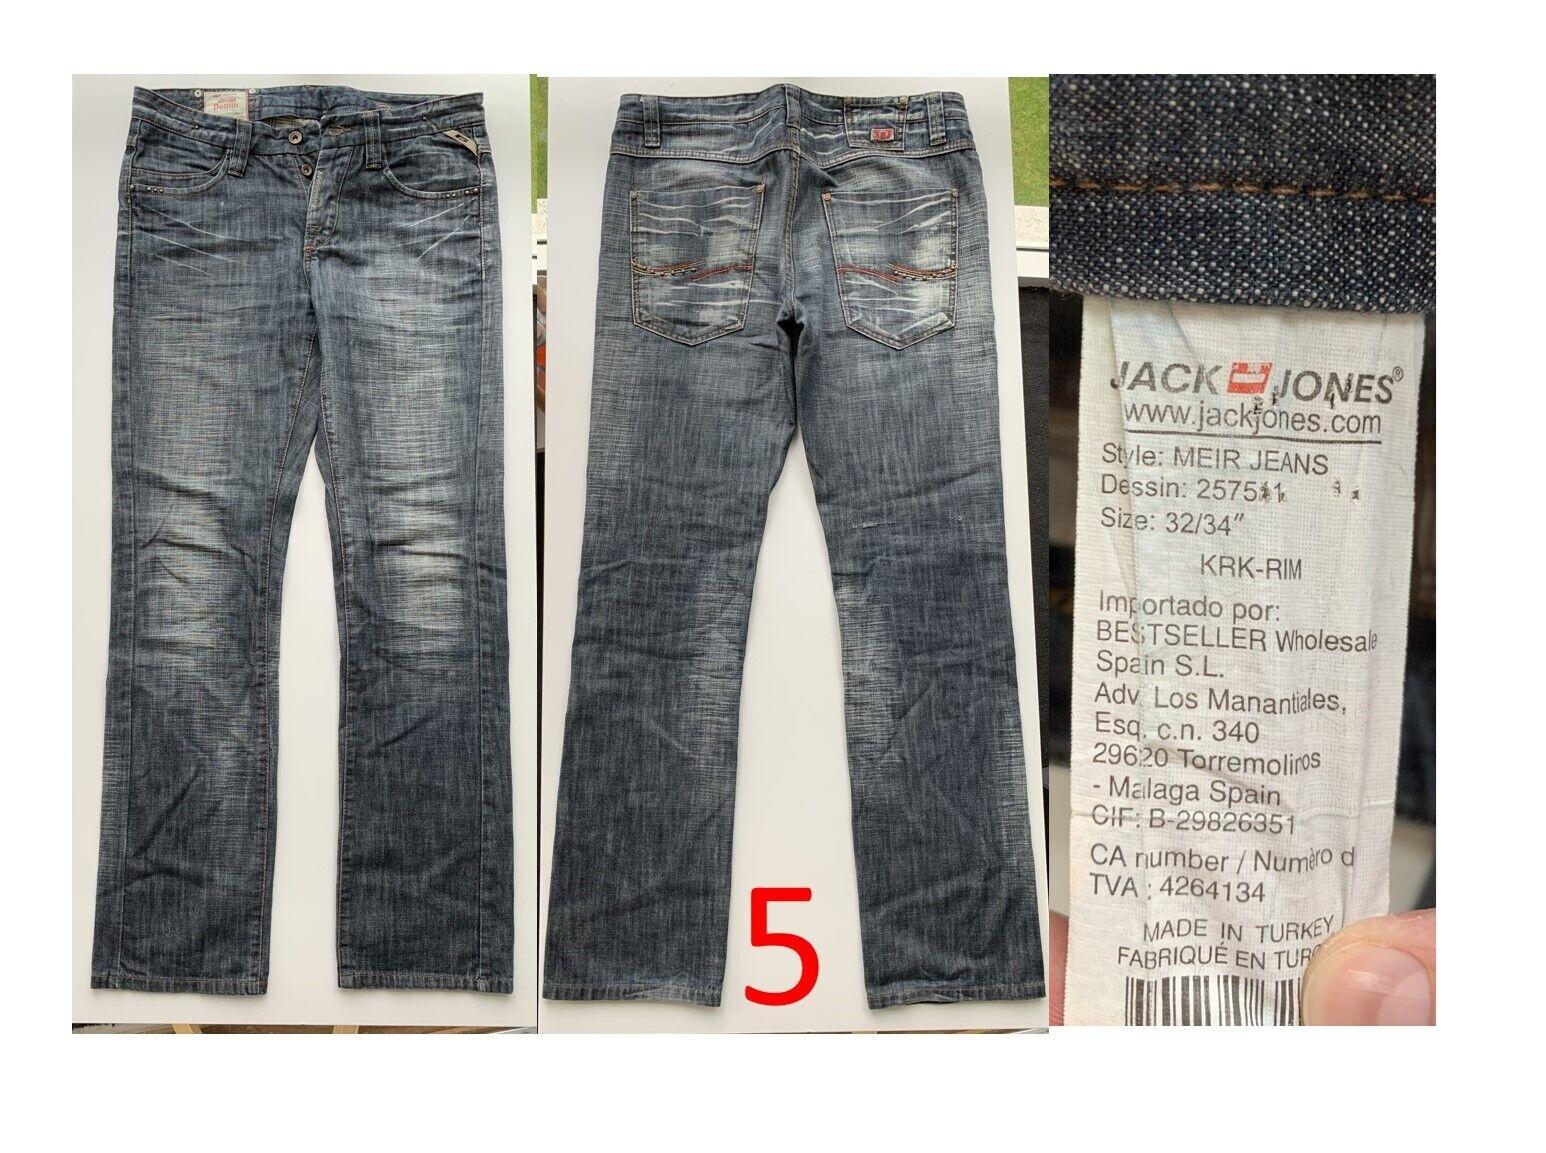 Jeans, Replay, Jack&Jones